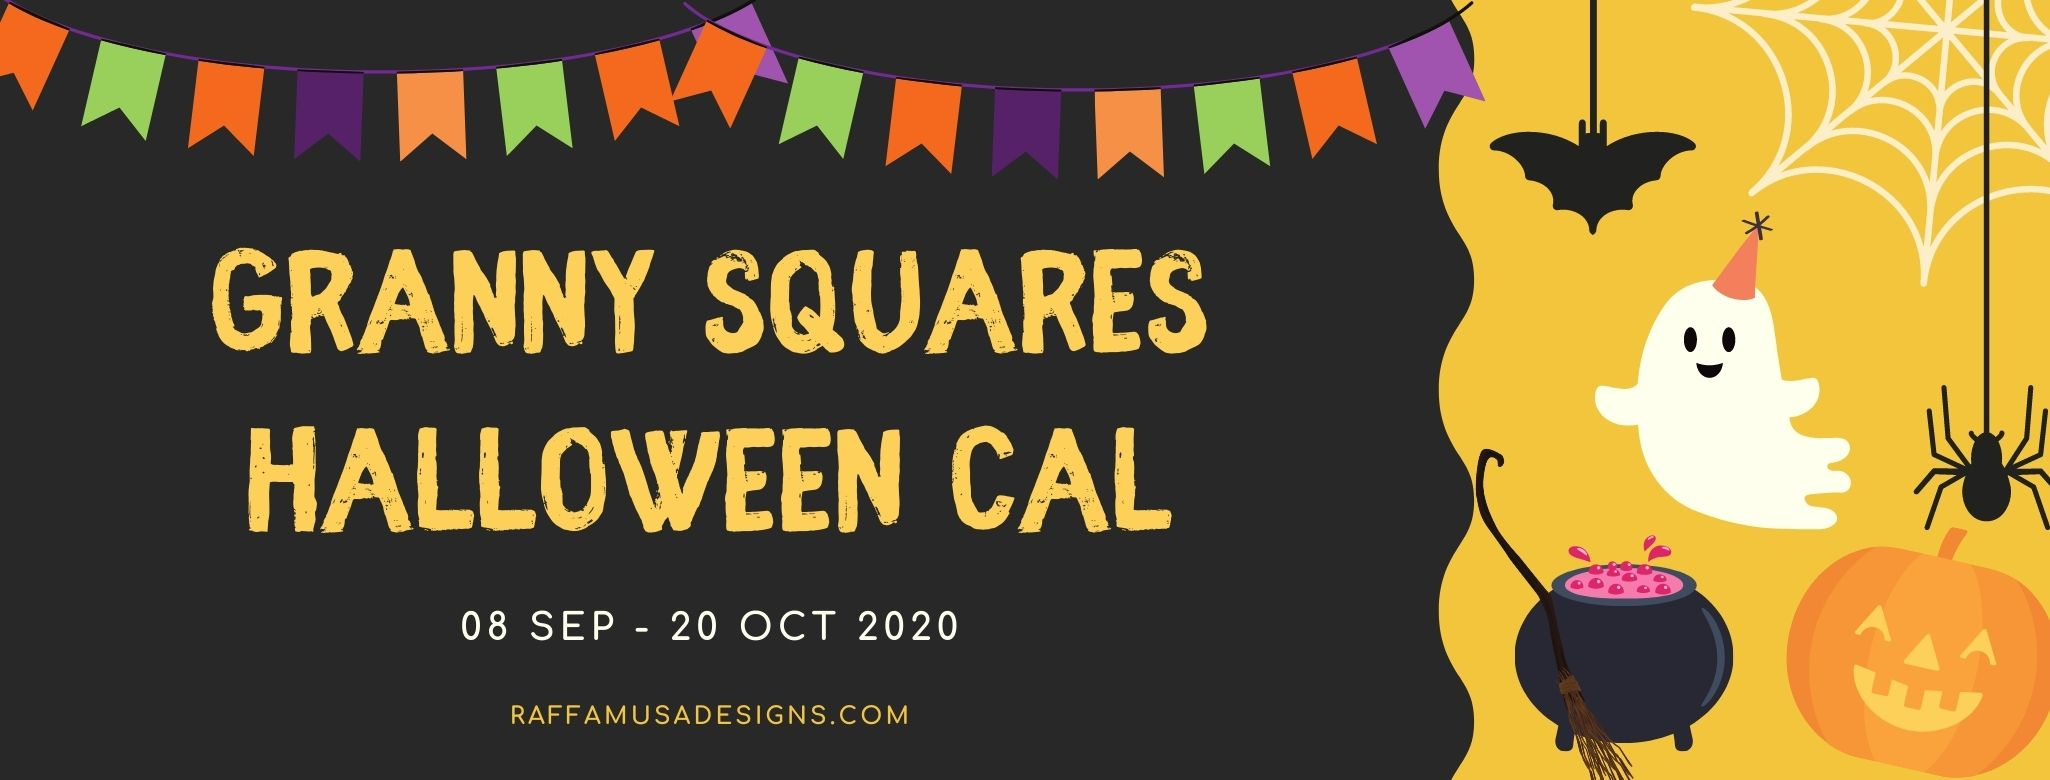 Halloween Granny Squares CAL